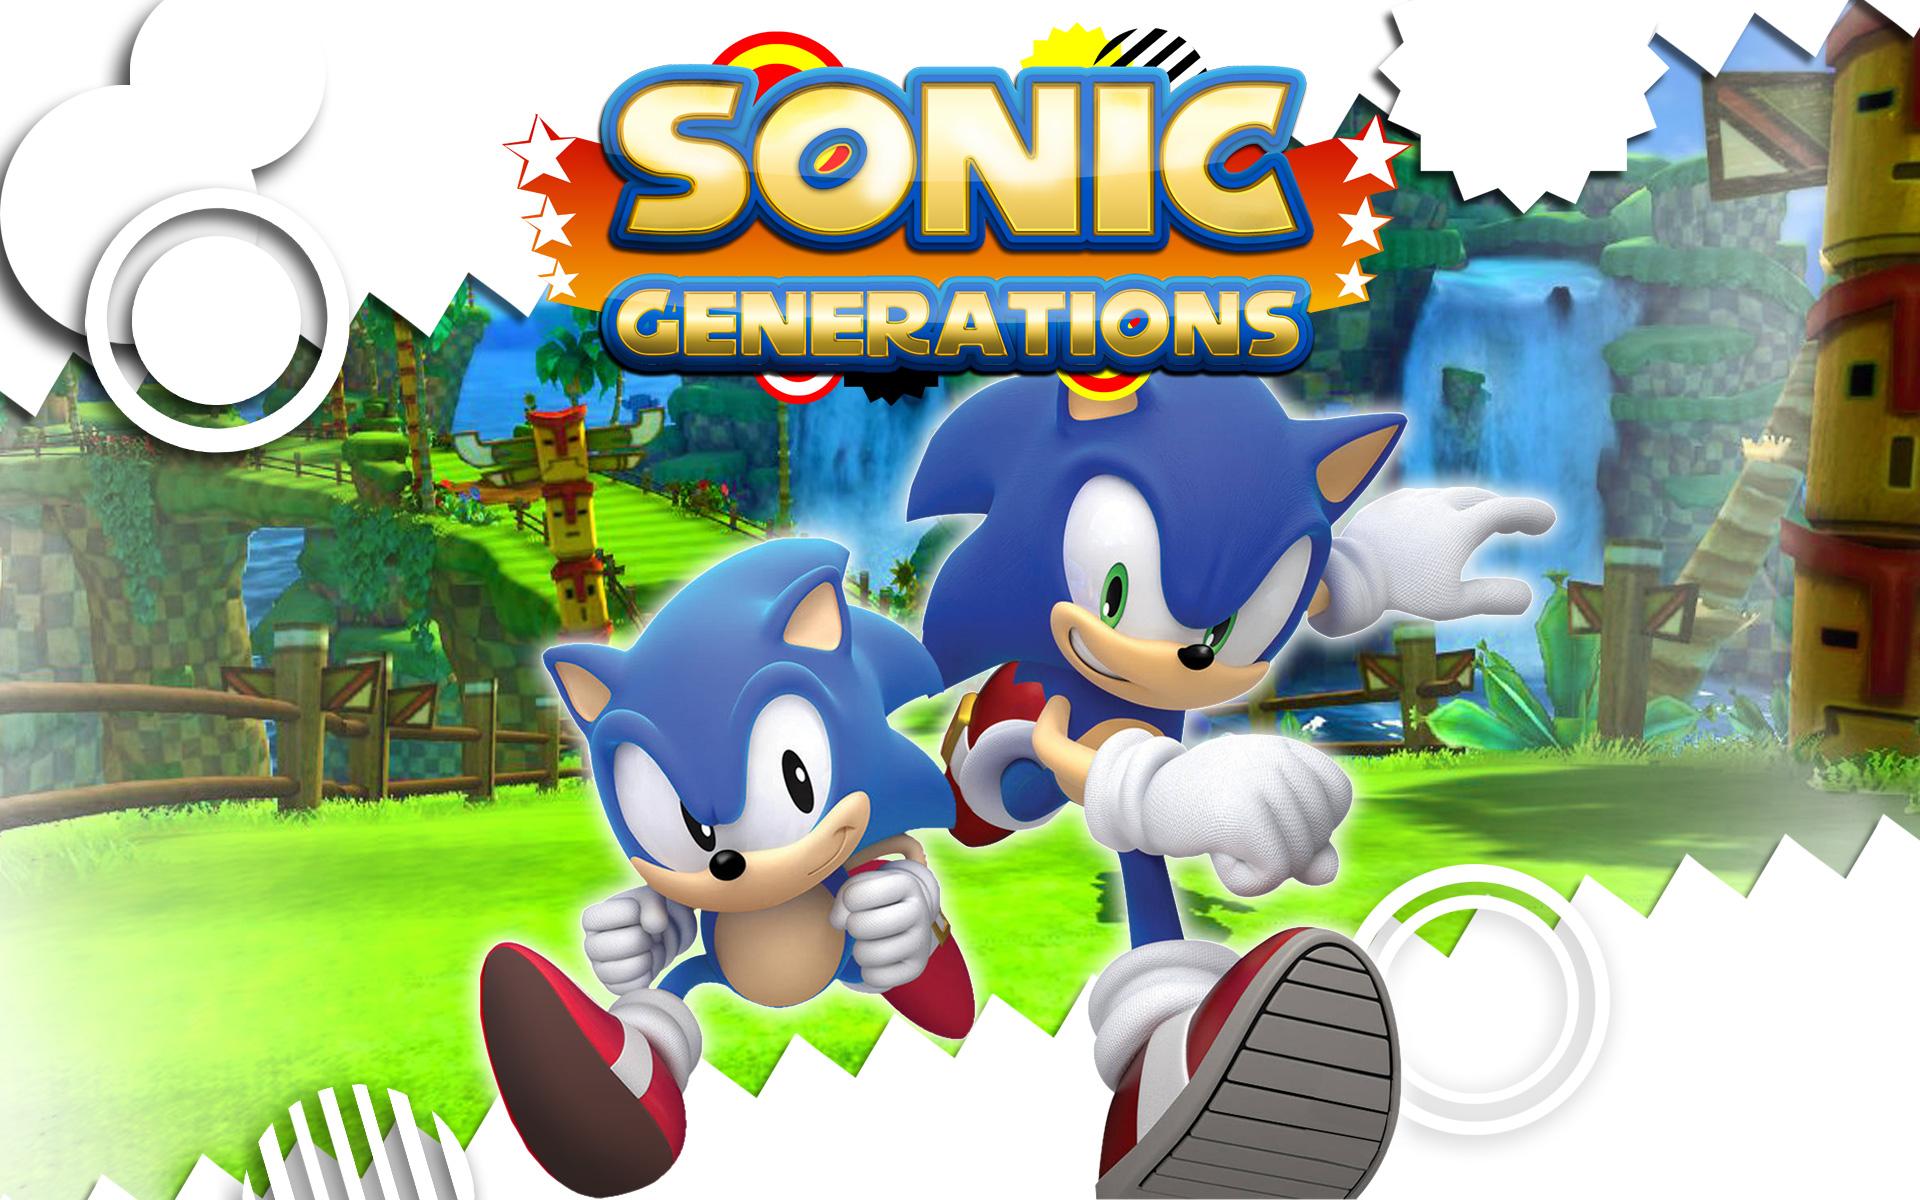 Free Sonic Generations Wallpaper in 1920x1200